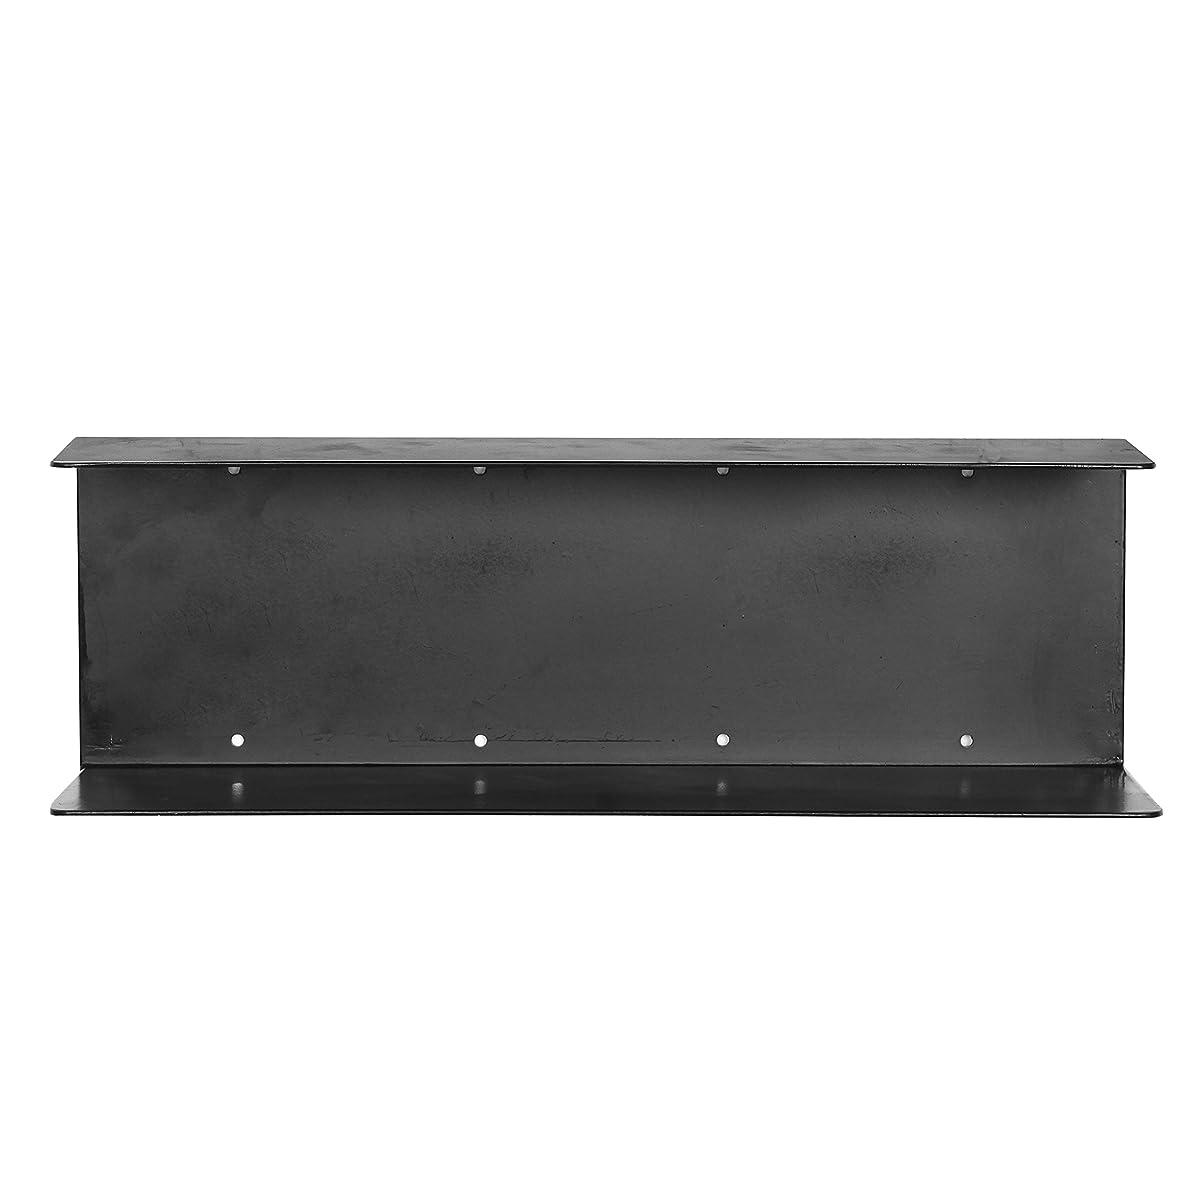 Modern Minimalist Black Metal Wall Mounted 17 inch Floating Shelves/Hanging Storage Rack Supply Shelf